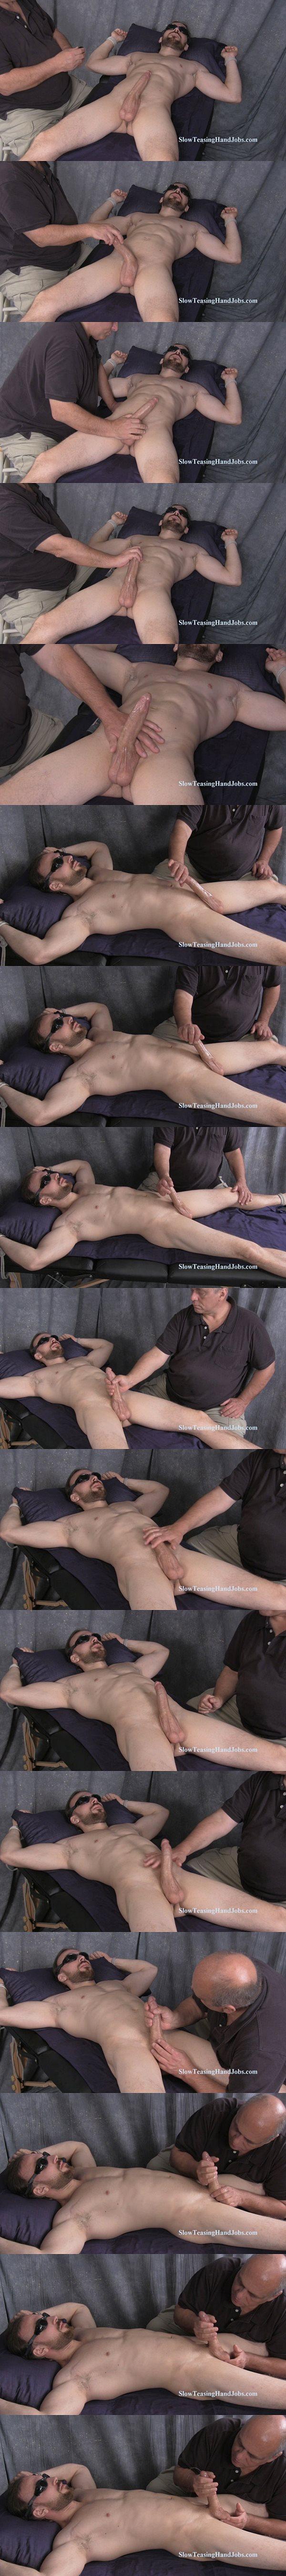 Masculine bearded straight plumber Mark slowly jerked off at Slowteasinghandjobs 02